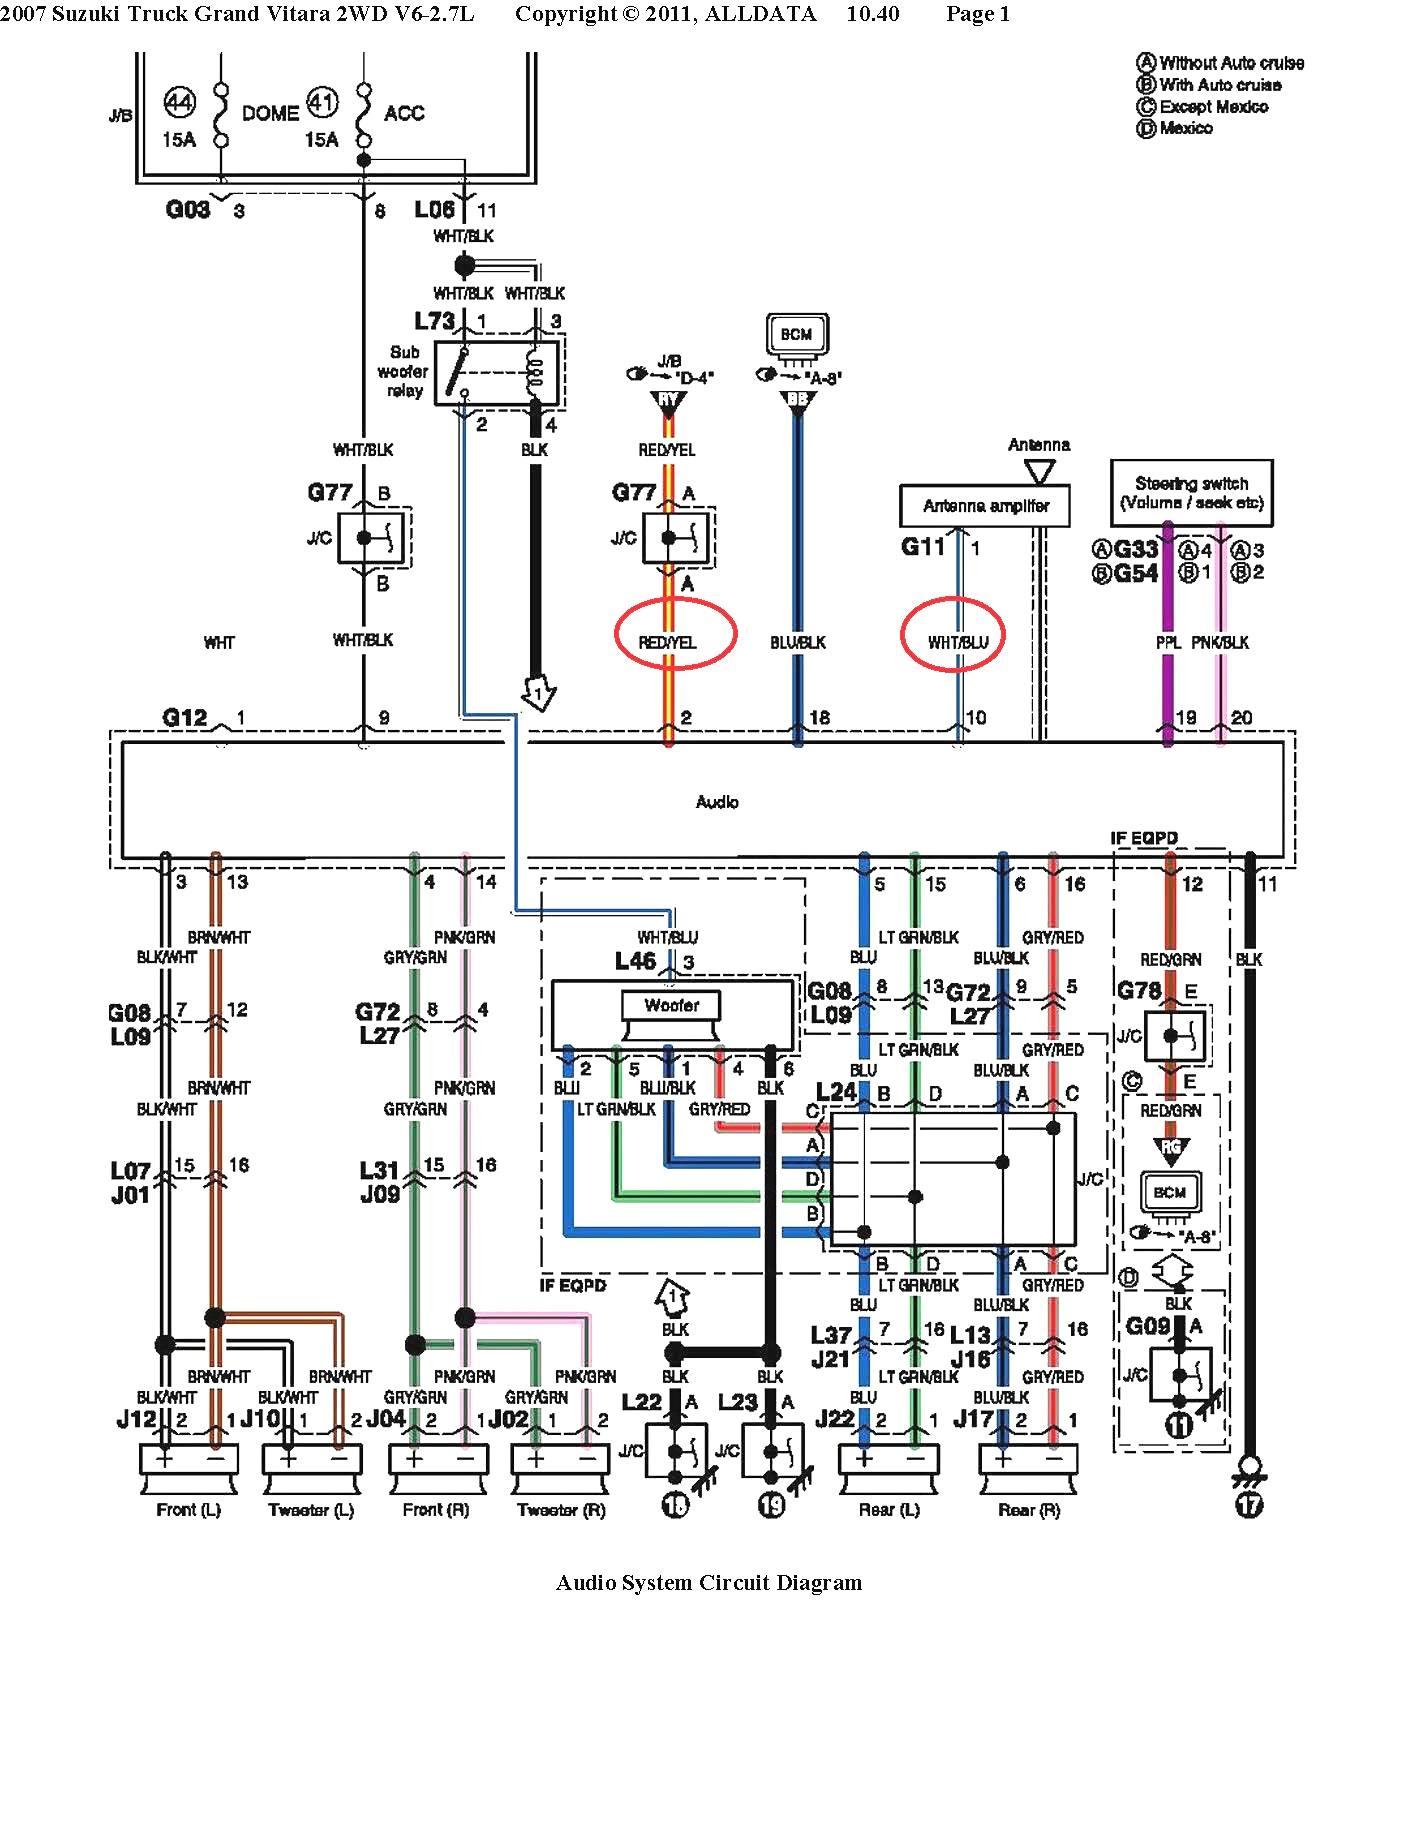 Schema Electrique Can Am Spyder